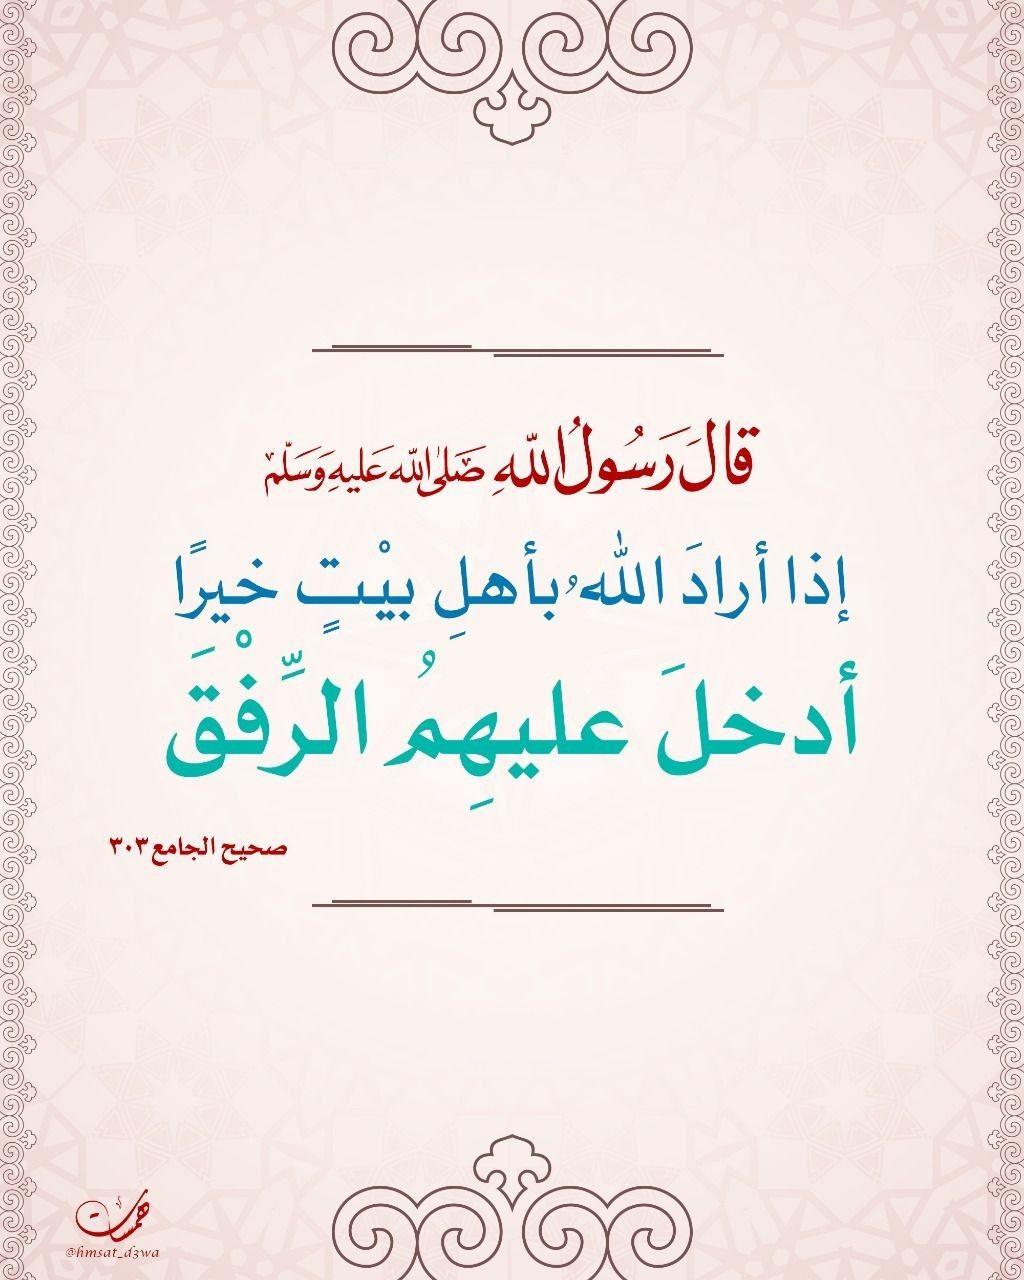 الرفق Words Arabic Calligraphy Calligraphy